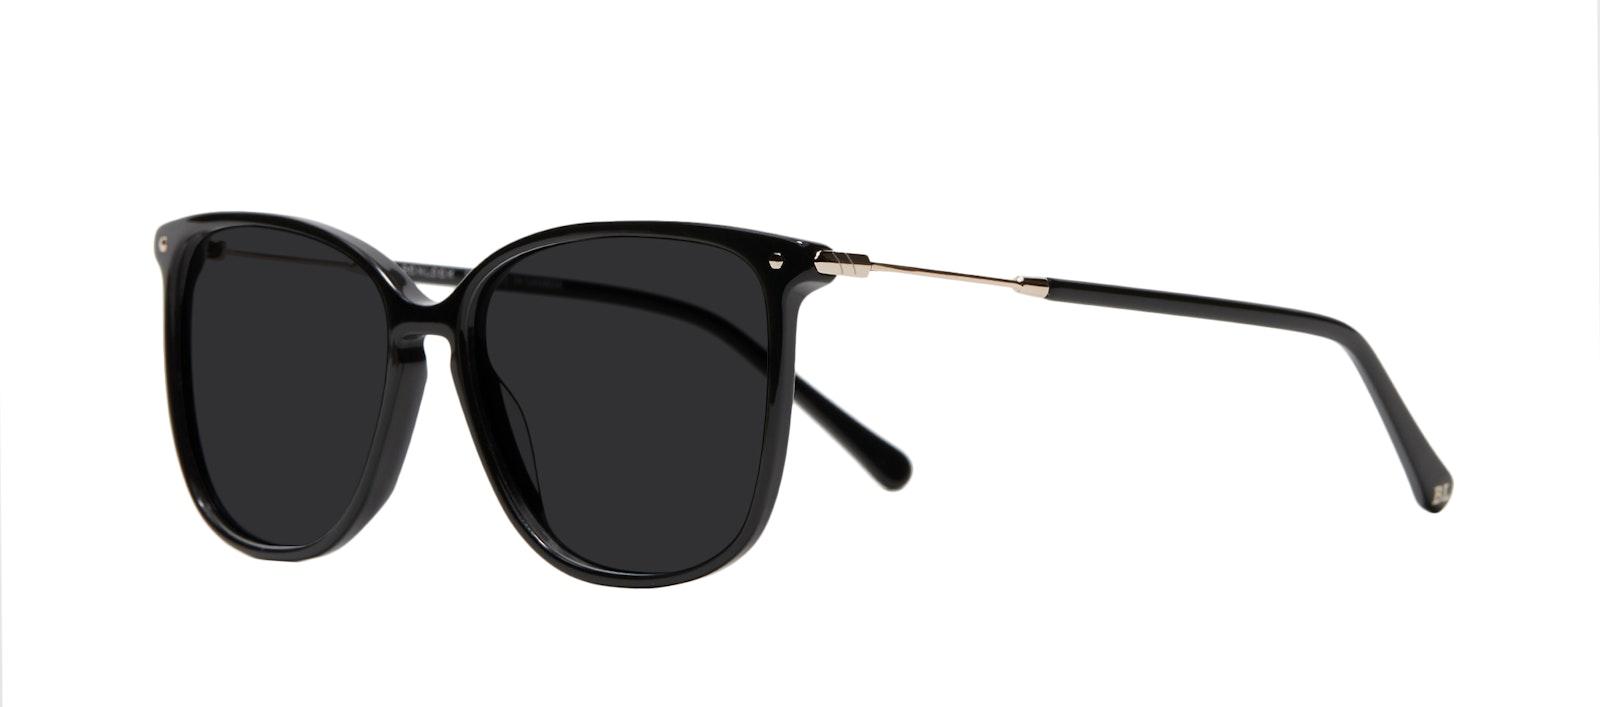 Affordable Fashion Glasses Square Sunglasses Women Sonia Pitch Black Tilt